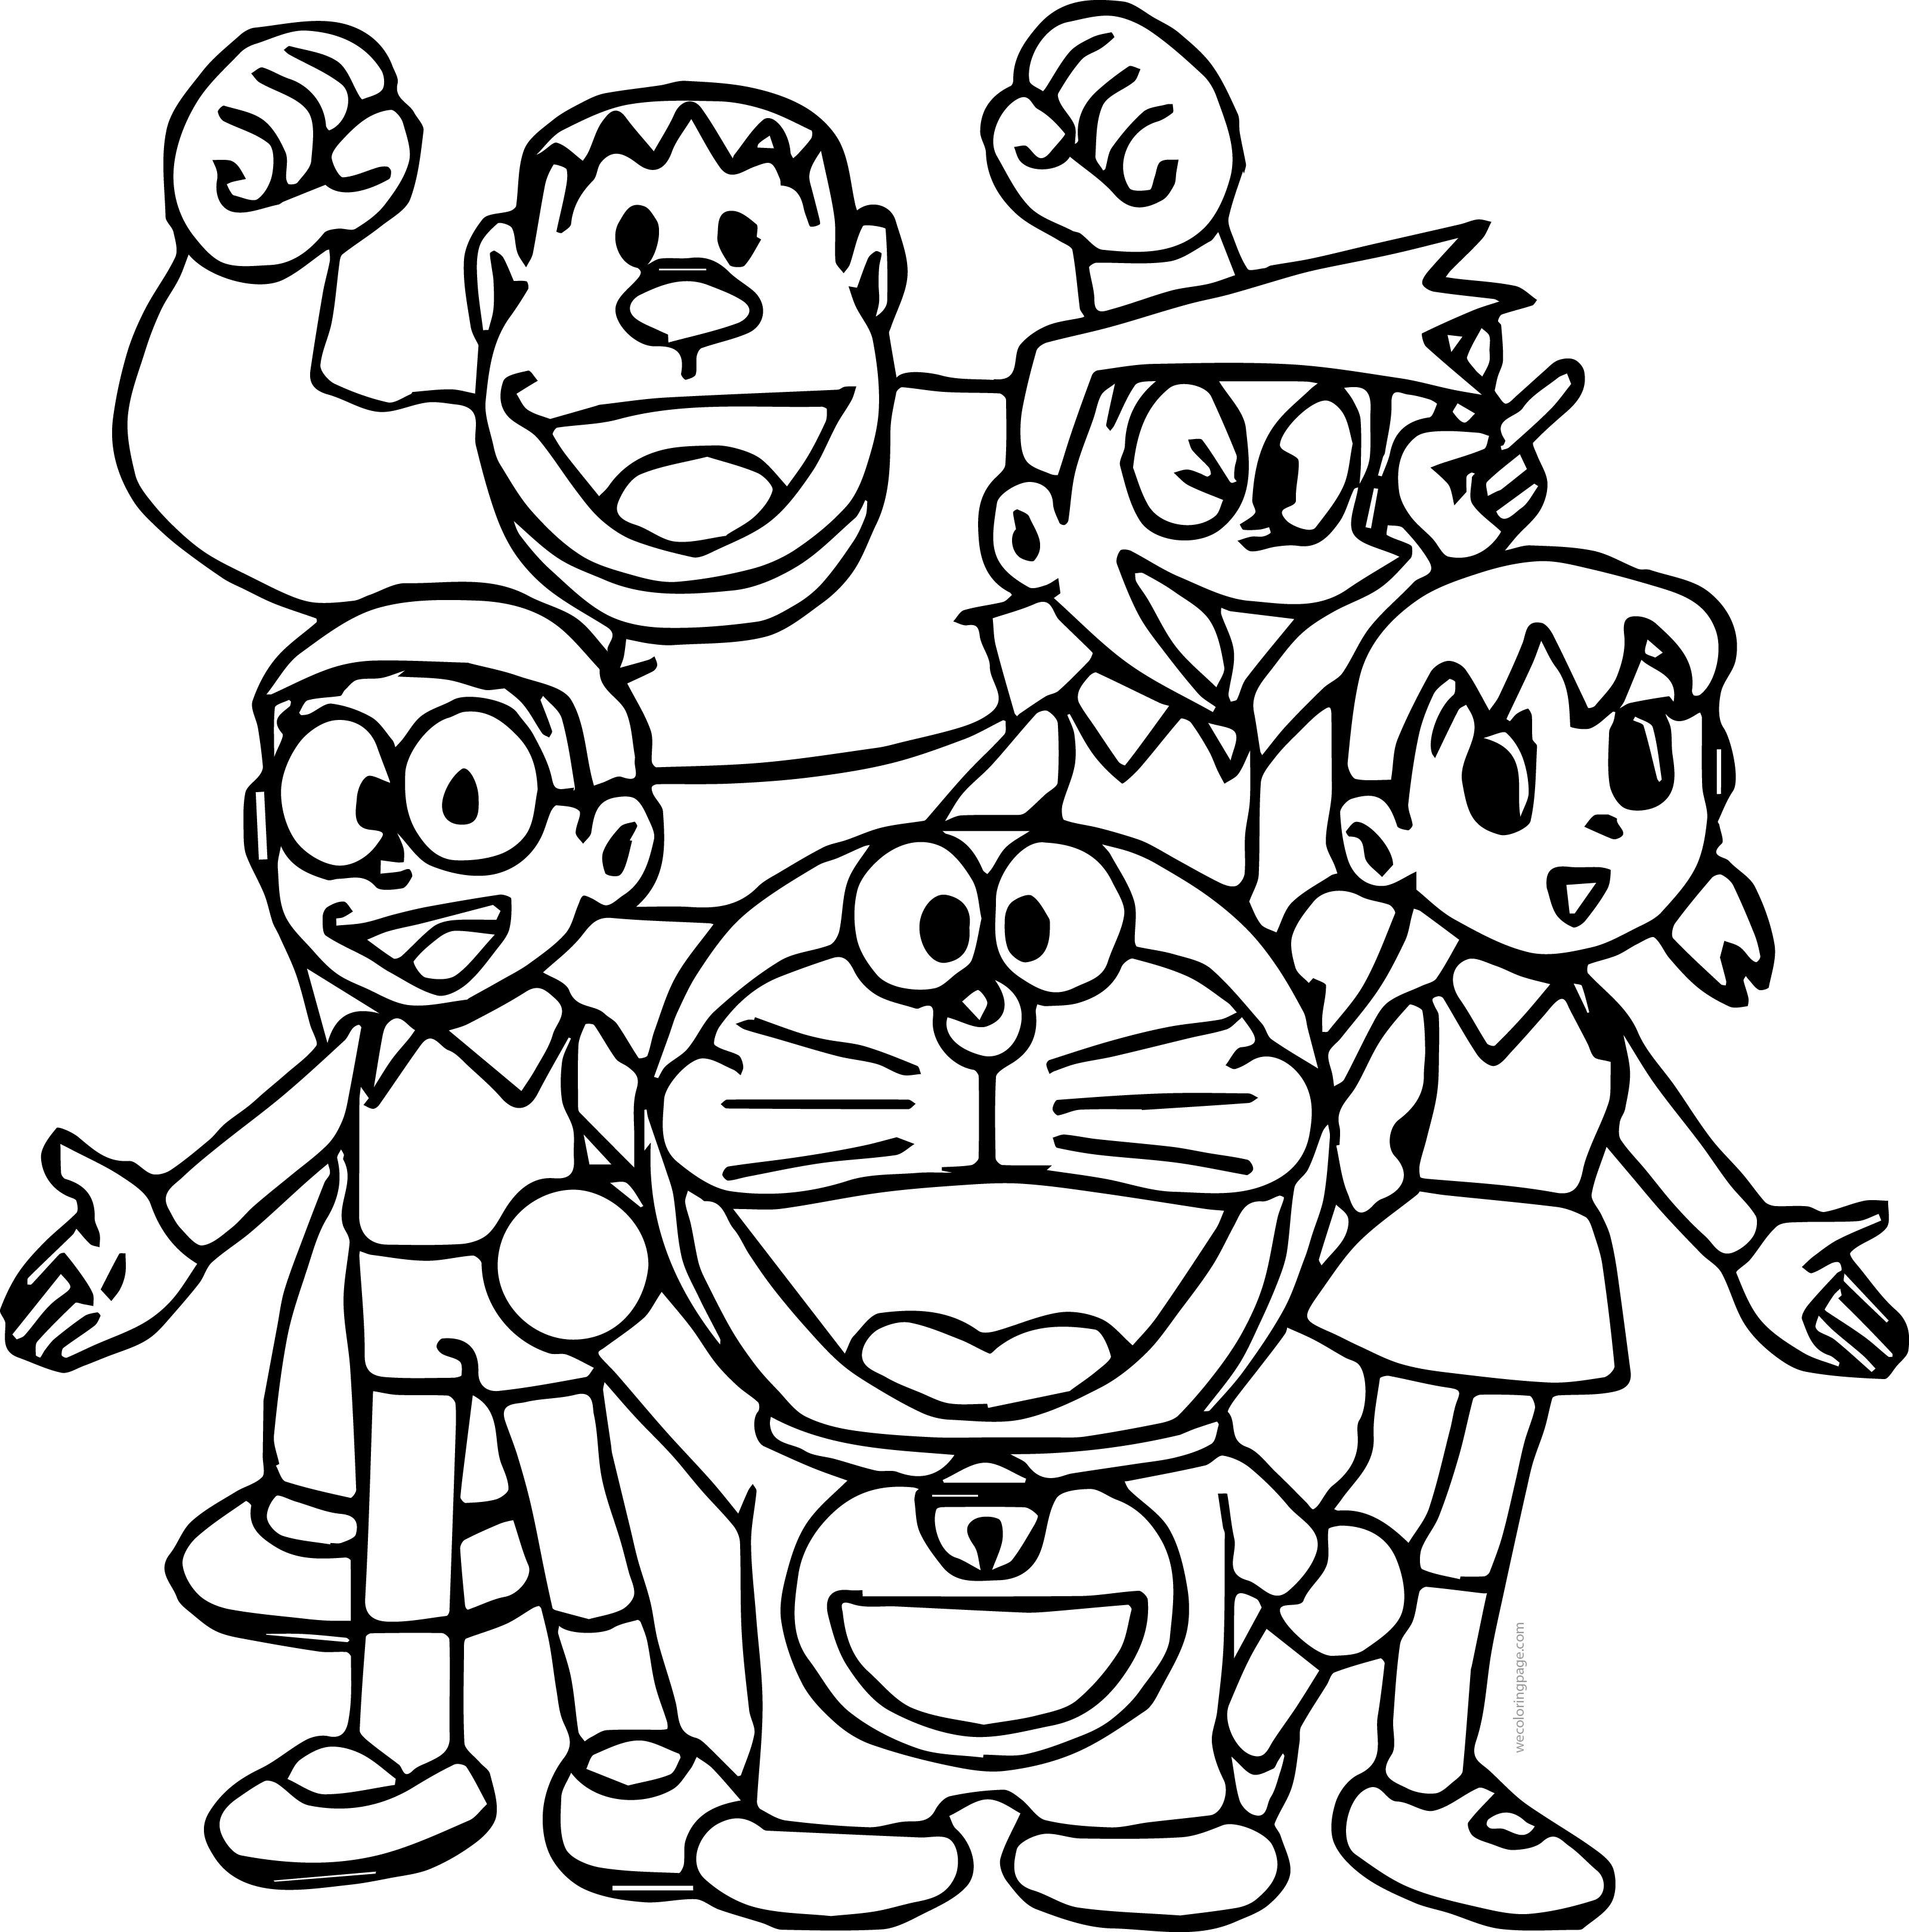 Doraemon Student Team Coloring Page